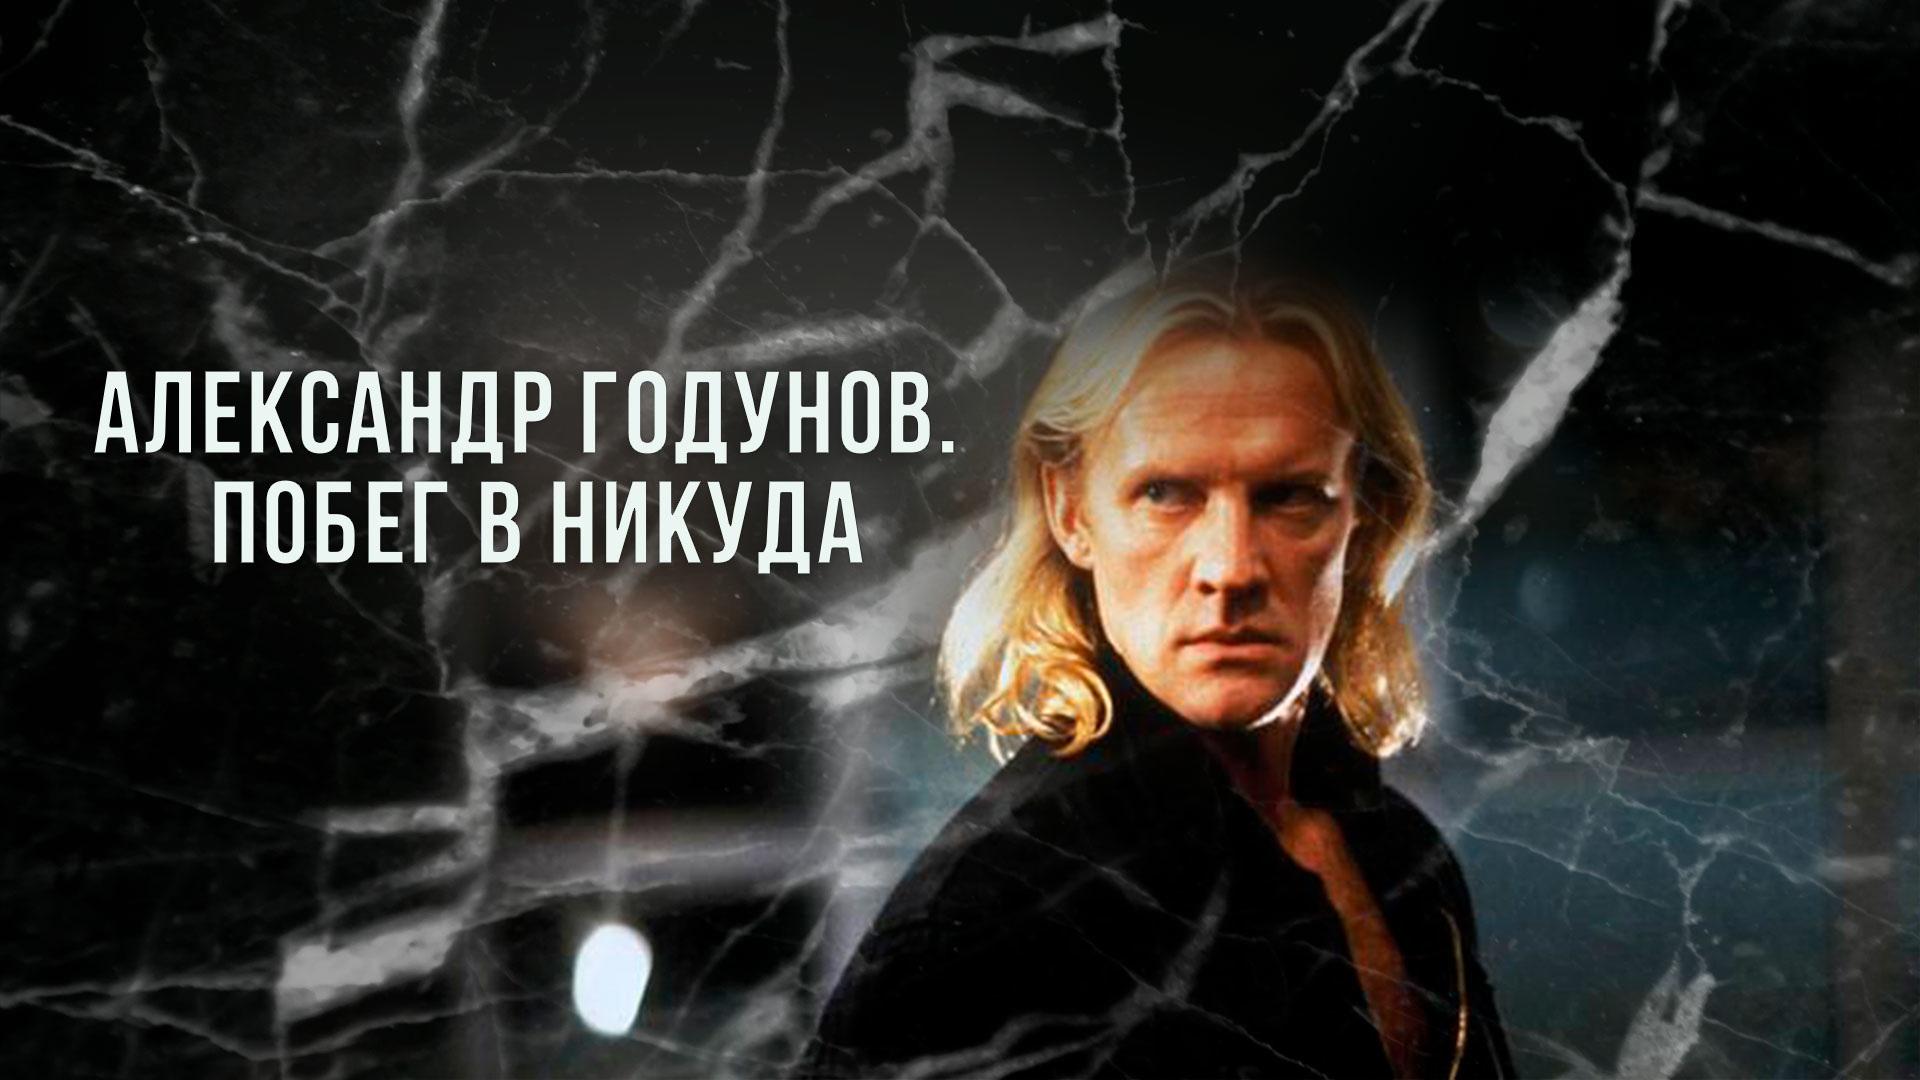 Александр Годунов. Побег в никуда